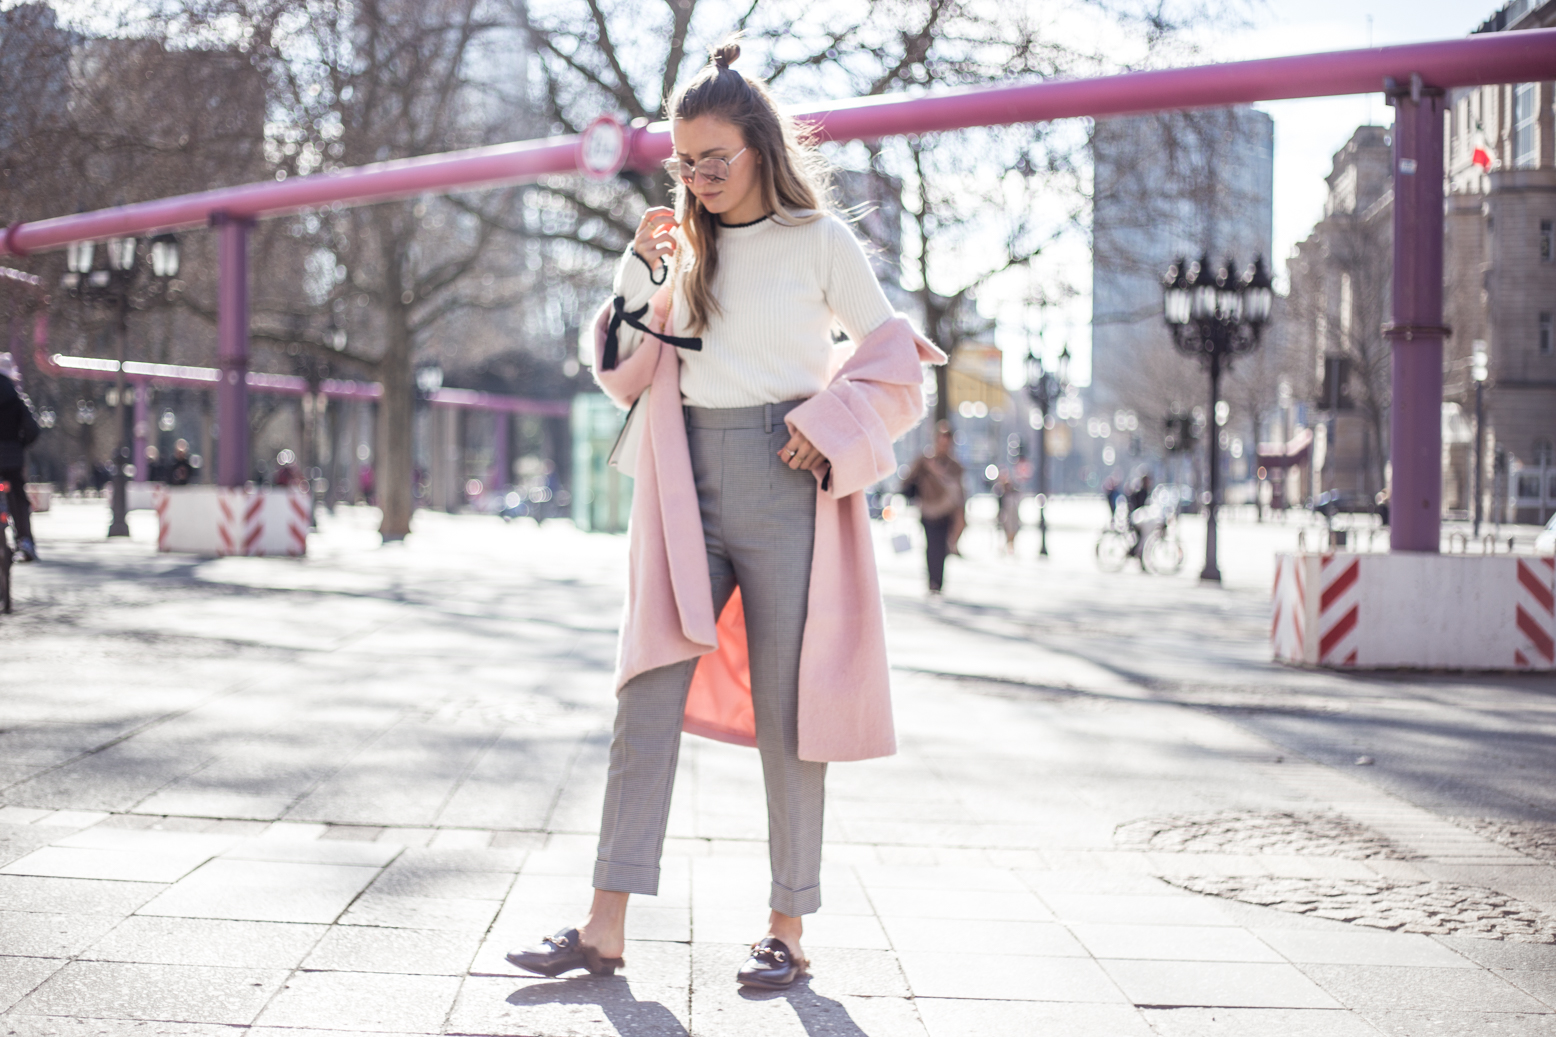 pink-coat-gucci-slipper-livia-auer-1636